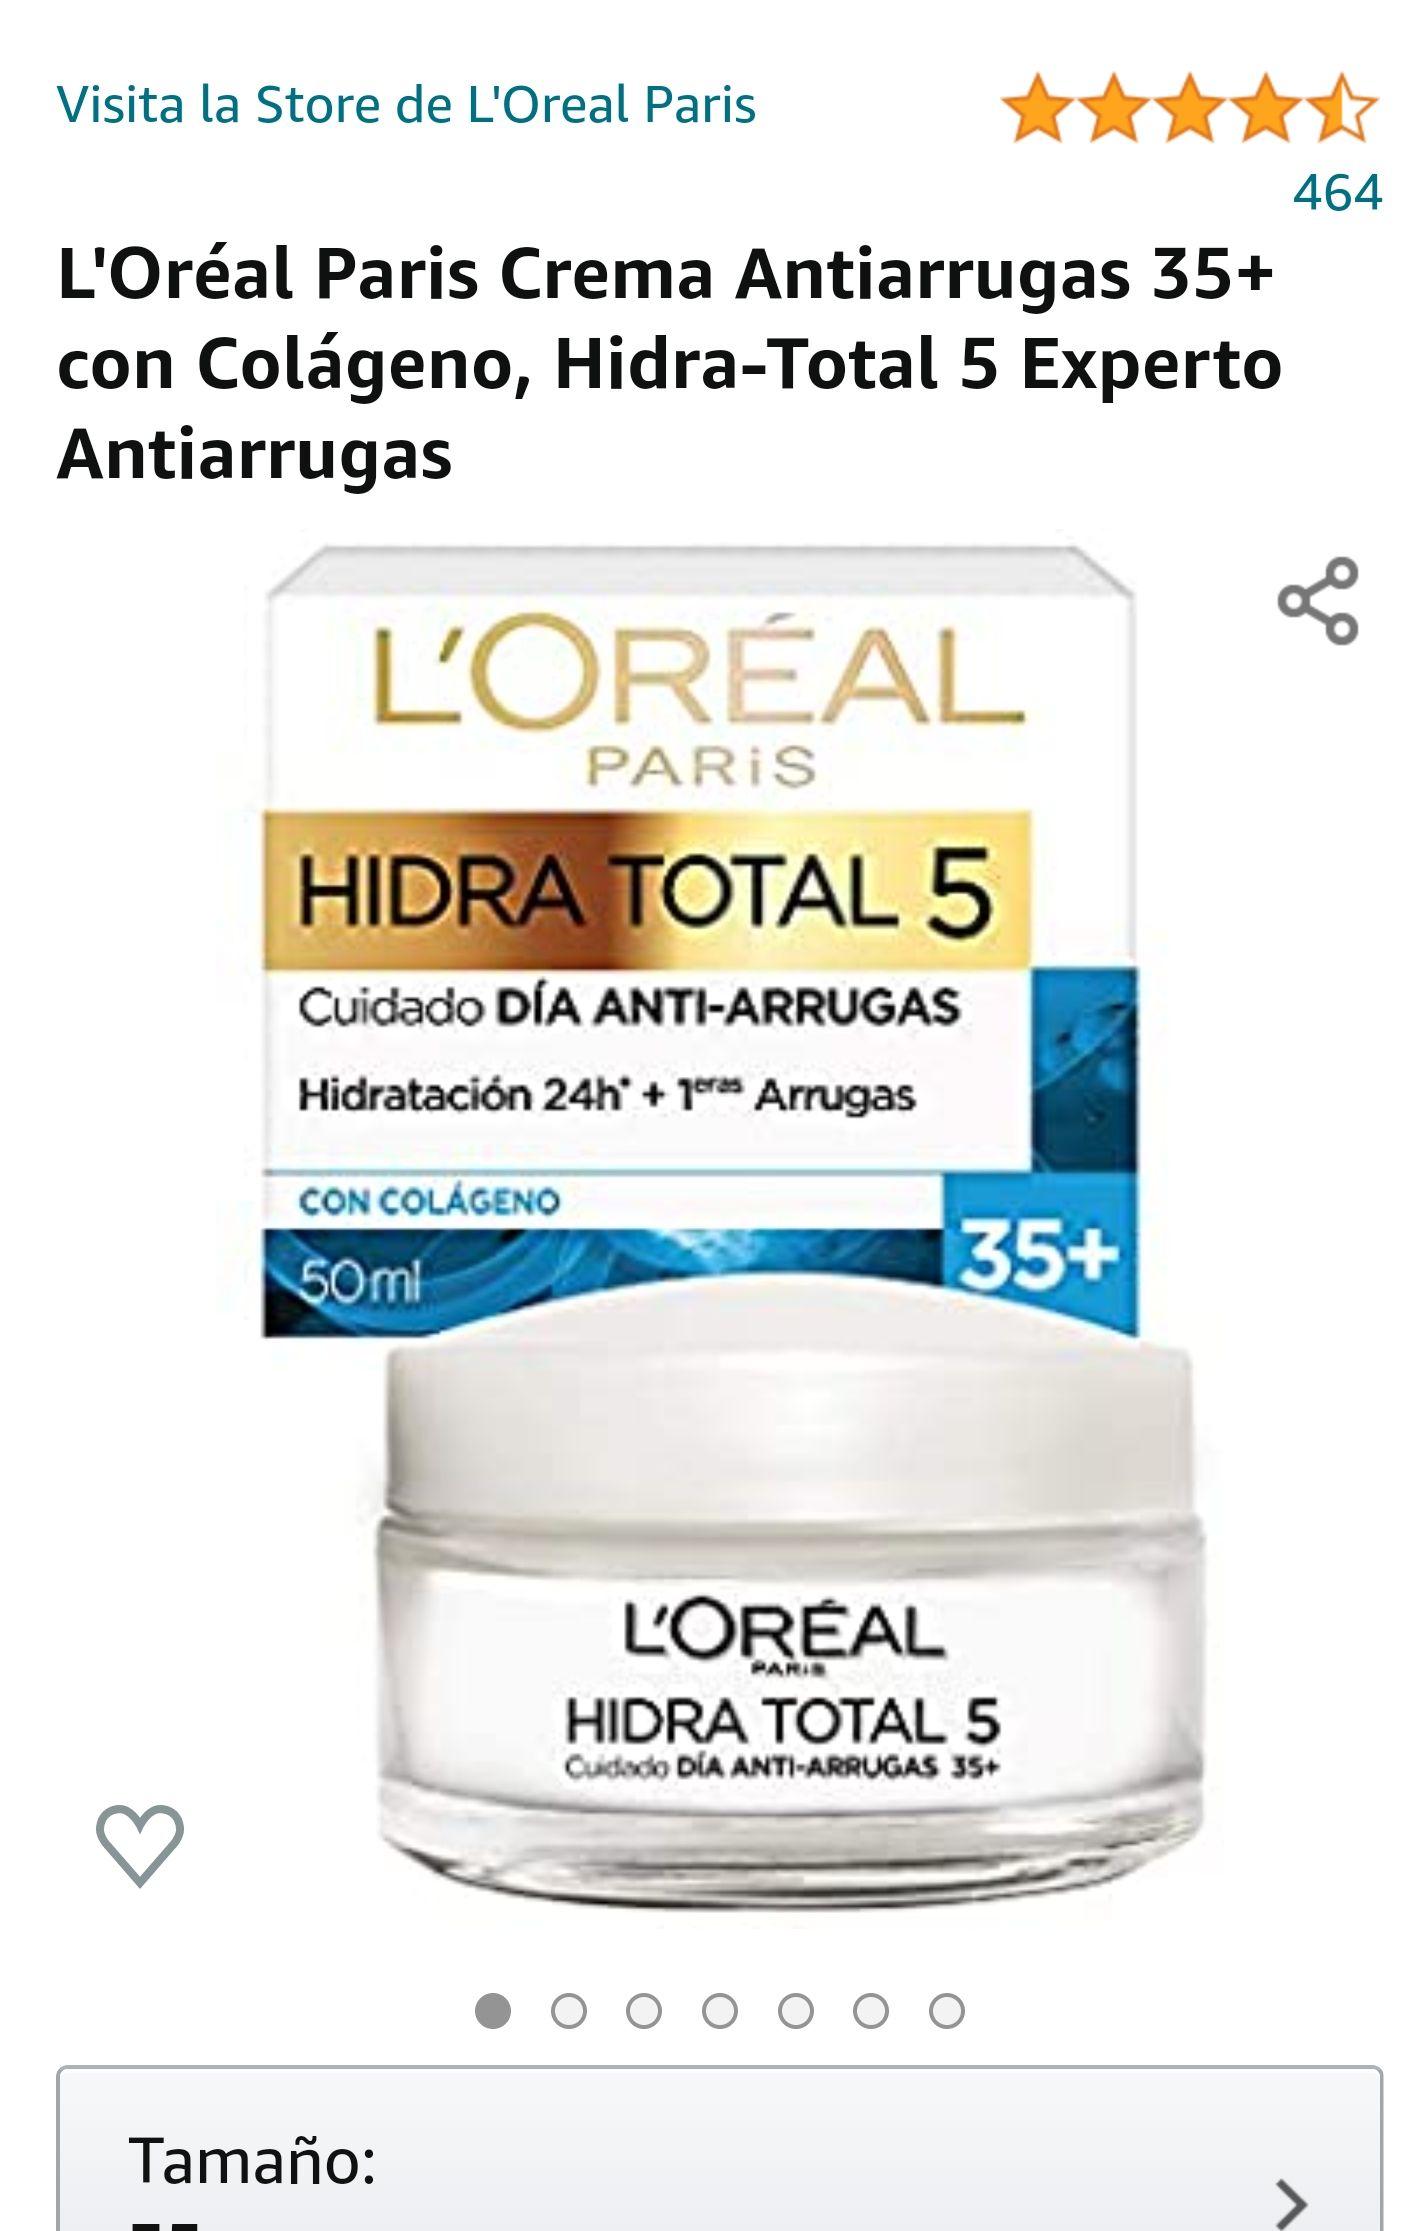 Amazon: L'Oréal Paris Crema Antiarrugas 35+ con Colágeno, Hidra-Total 5 Experto Antiarrugas